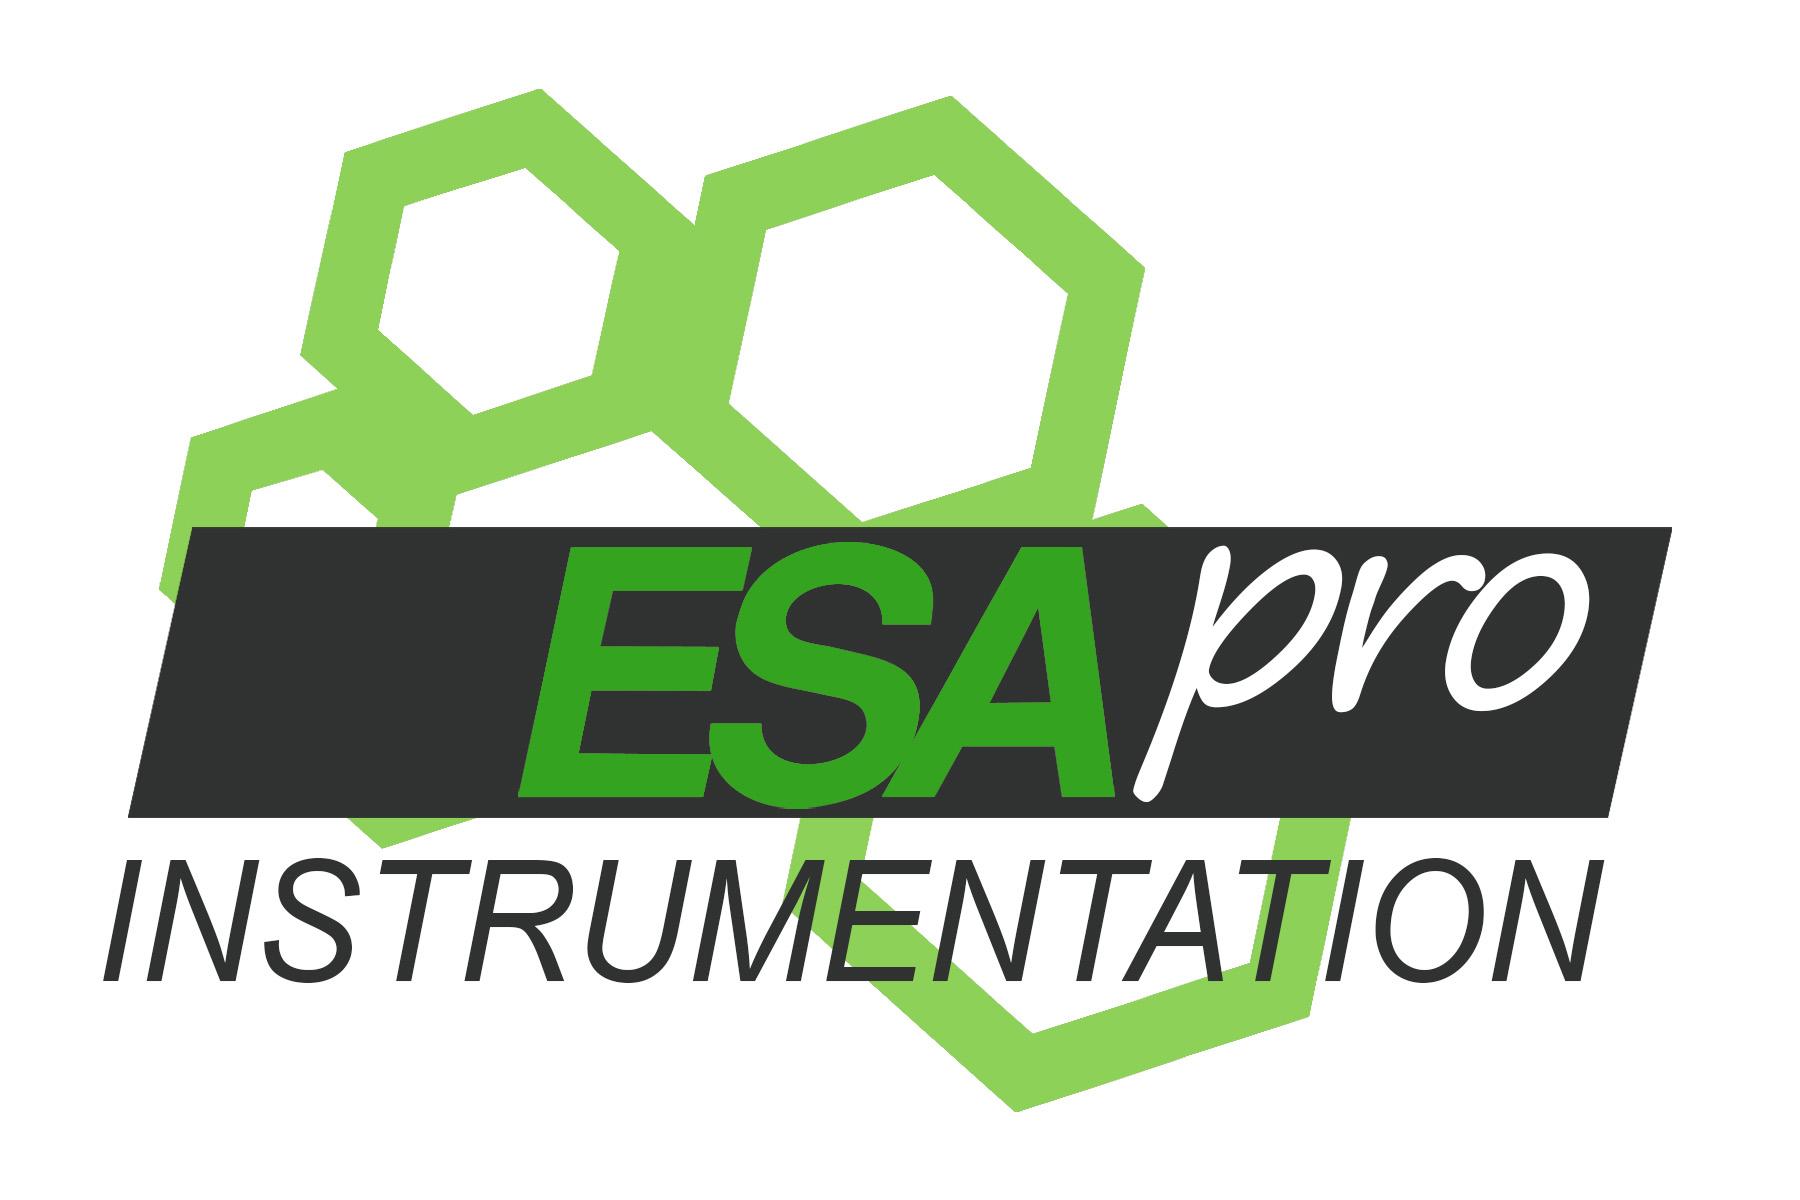 esapro-instrumentation-image-1